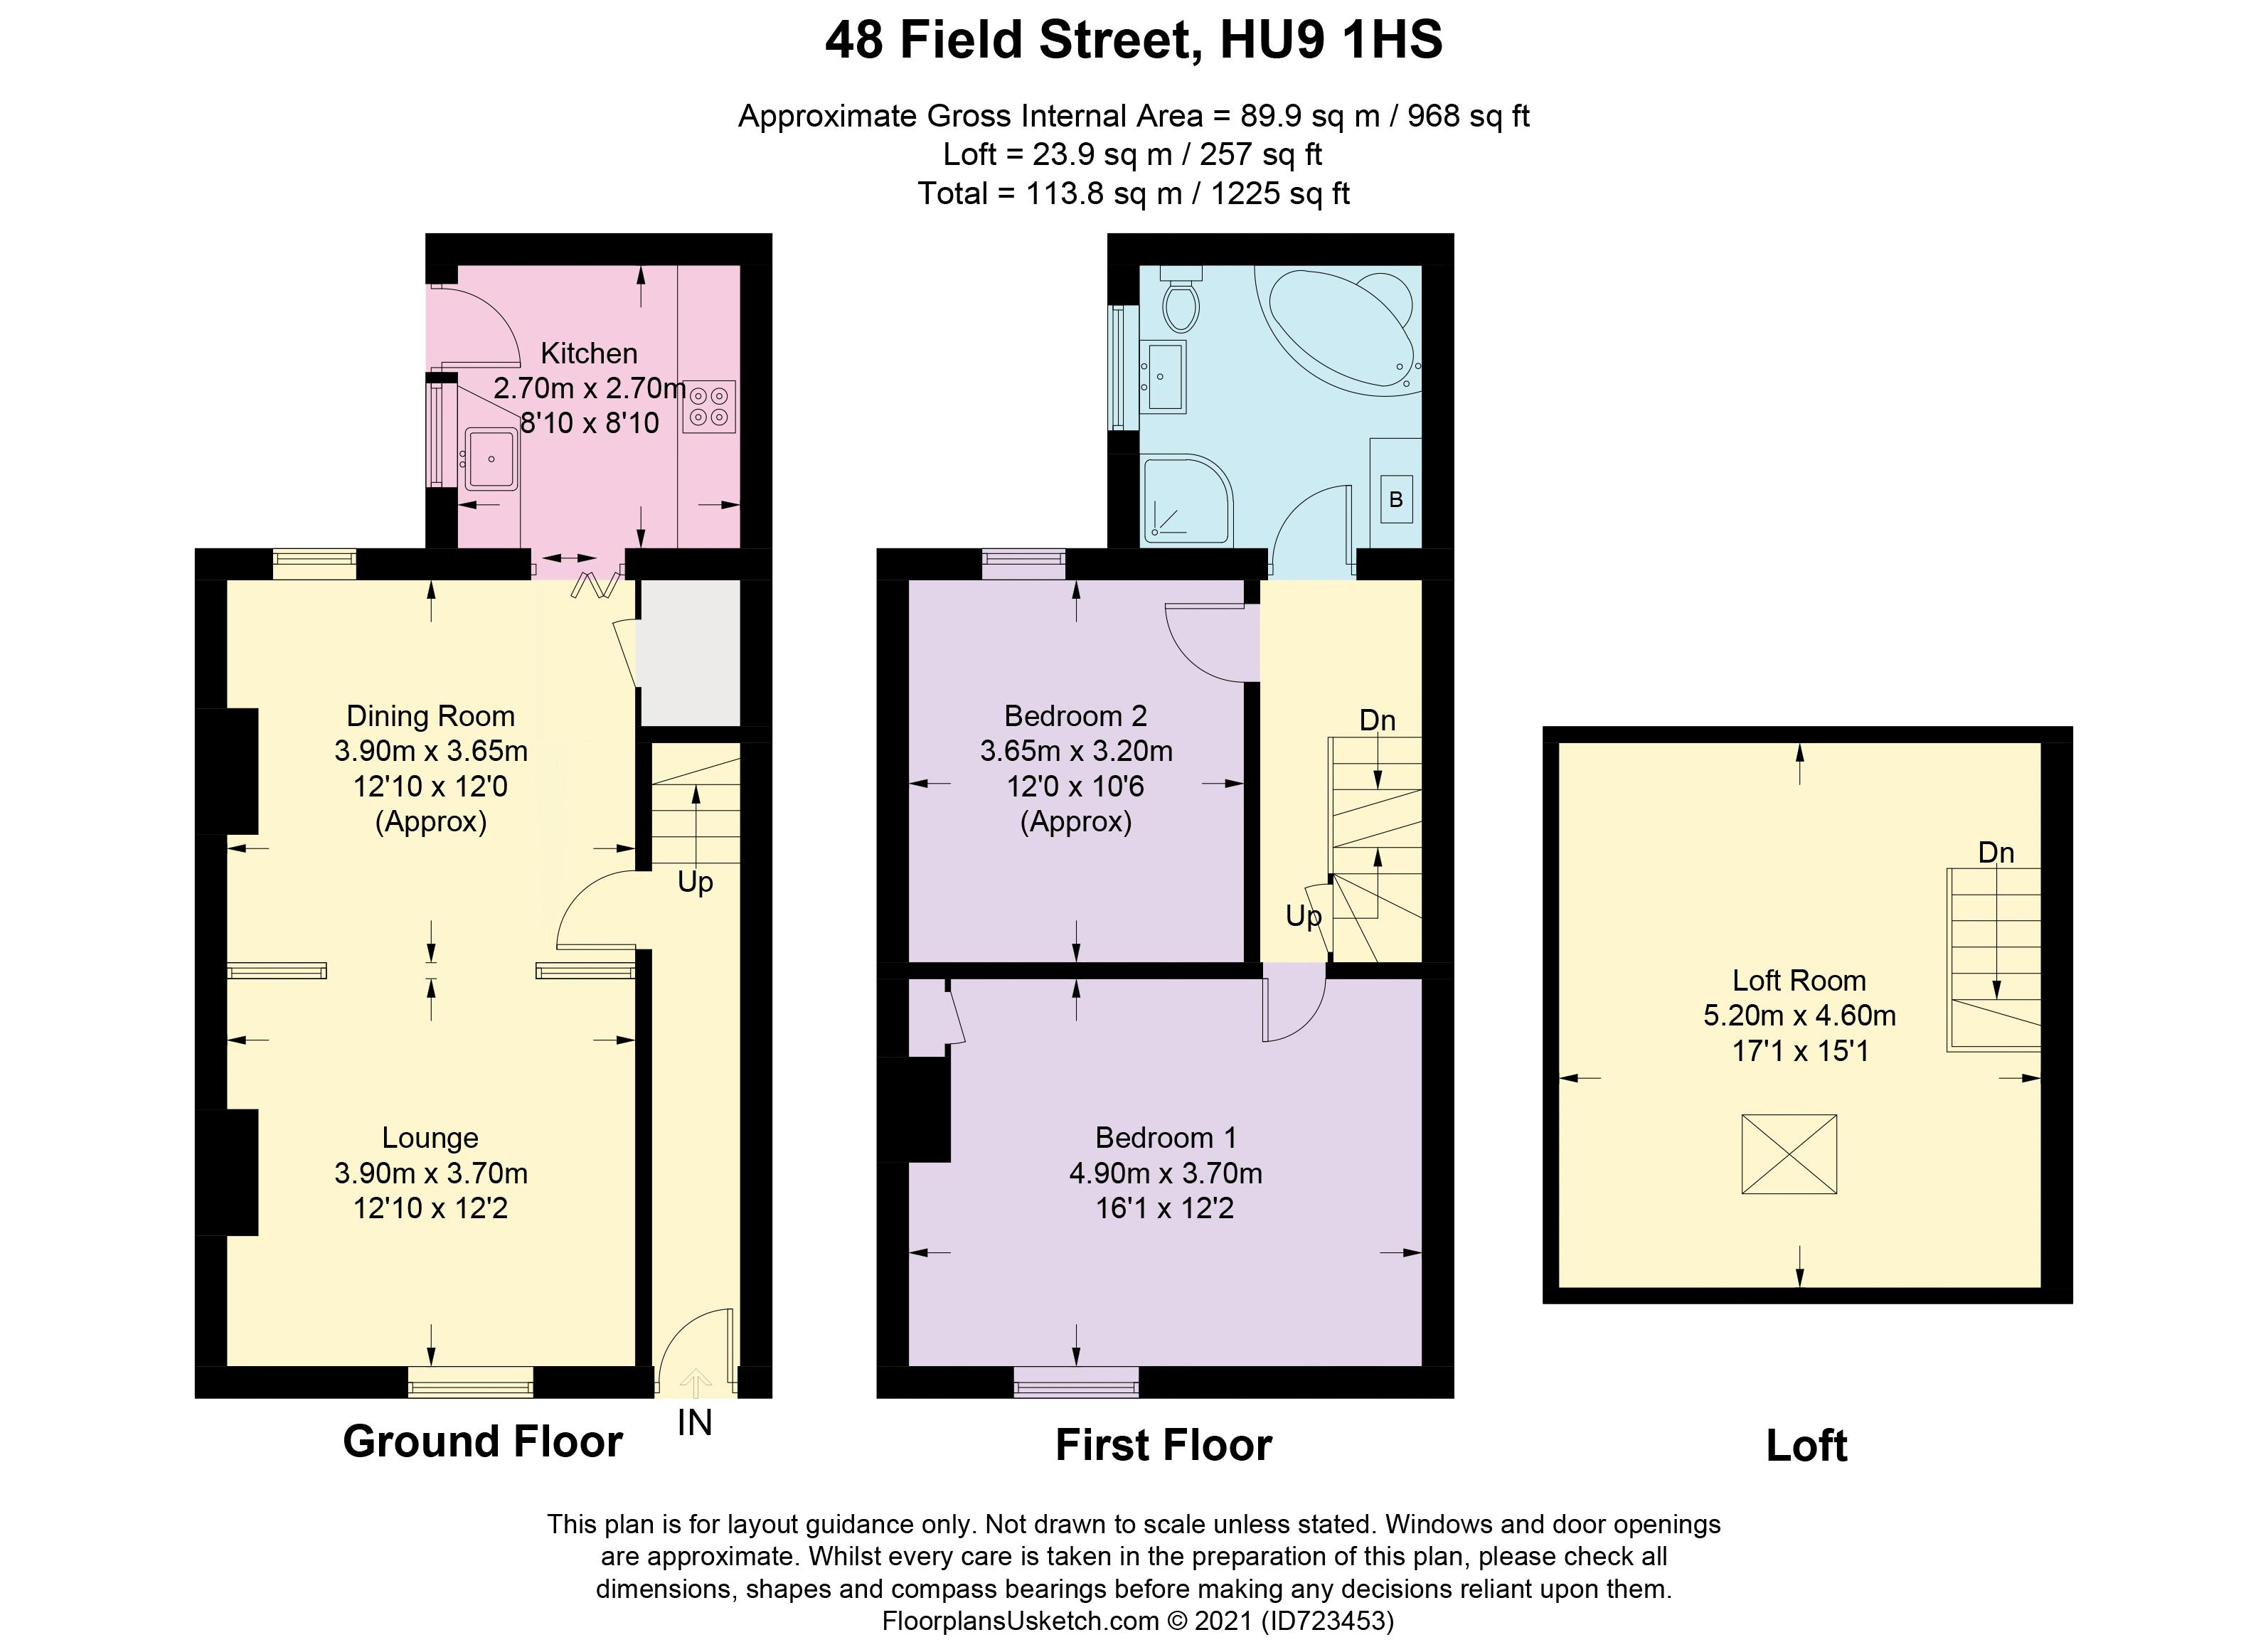 Field Street - Floorplan